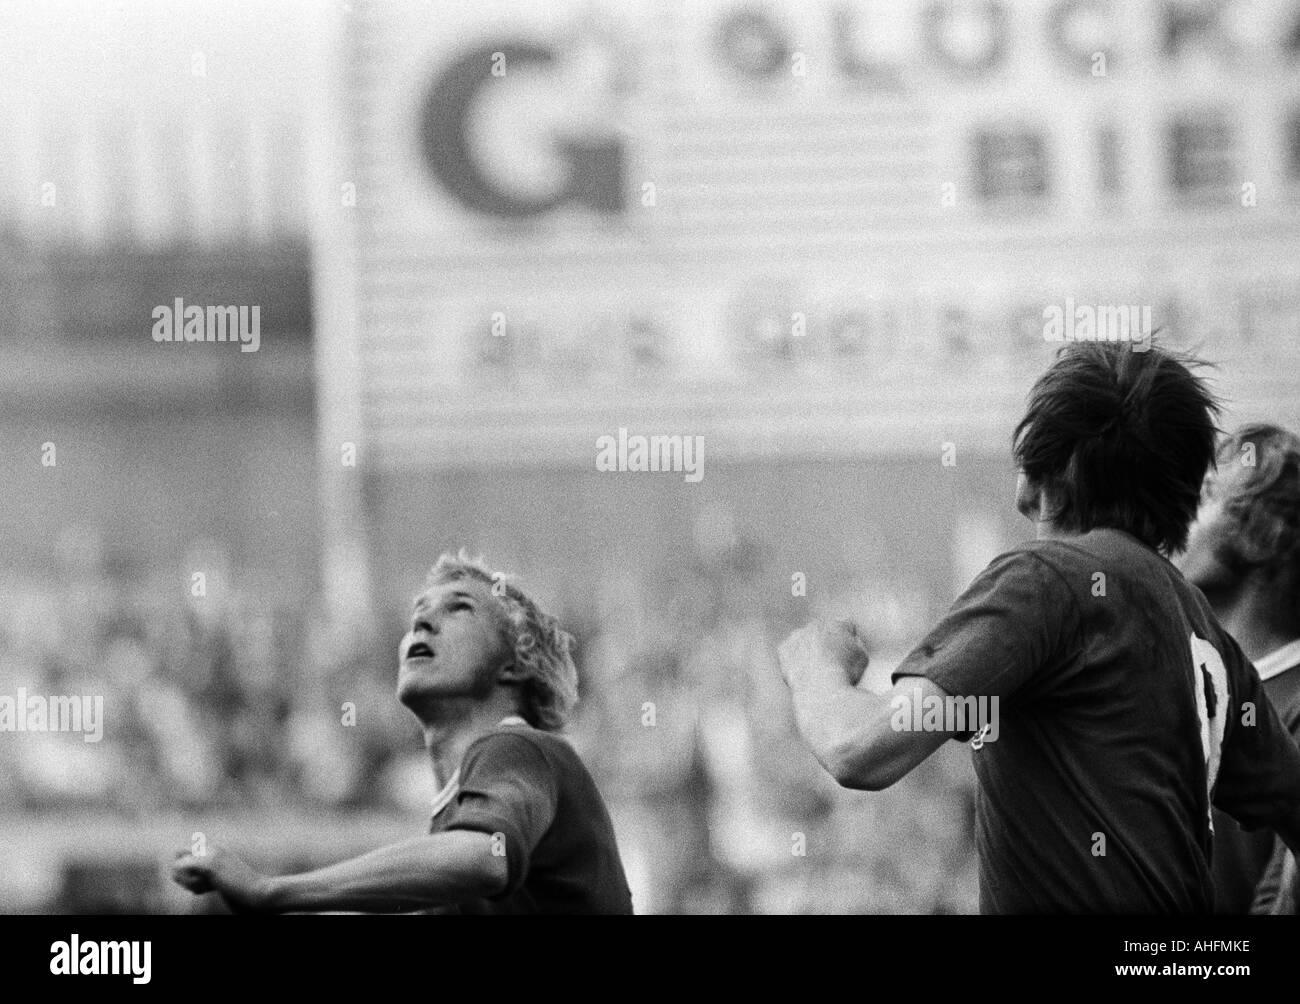 football, Bundesliga, 1971/1972, FC Schalke 04 versus Fortuna Duesseldorf 3:0, Glueckaufkampfbahn Stadium in Gelsenkirchen, scene of the match, Rolf Ruessmann (S04) - Stock Image